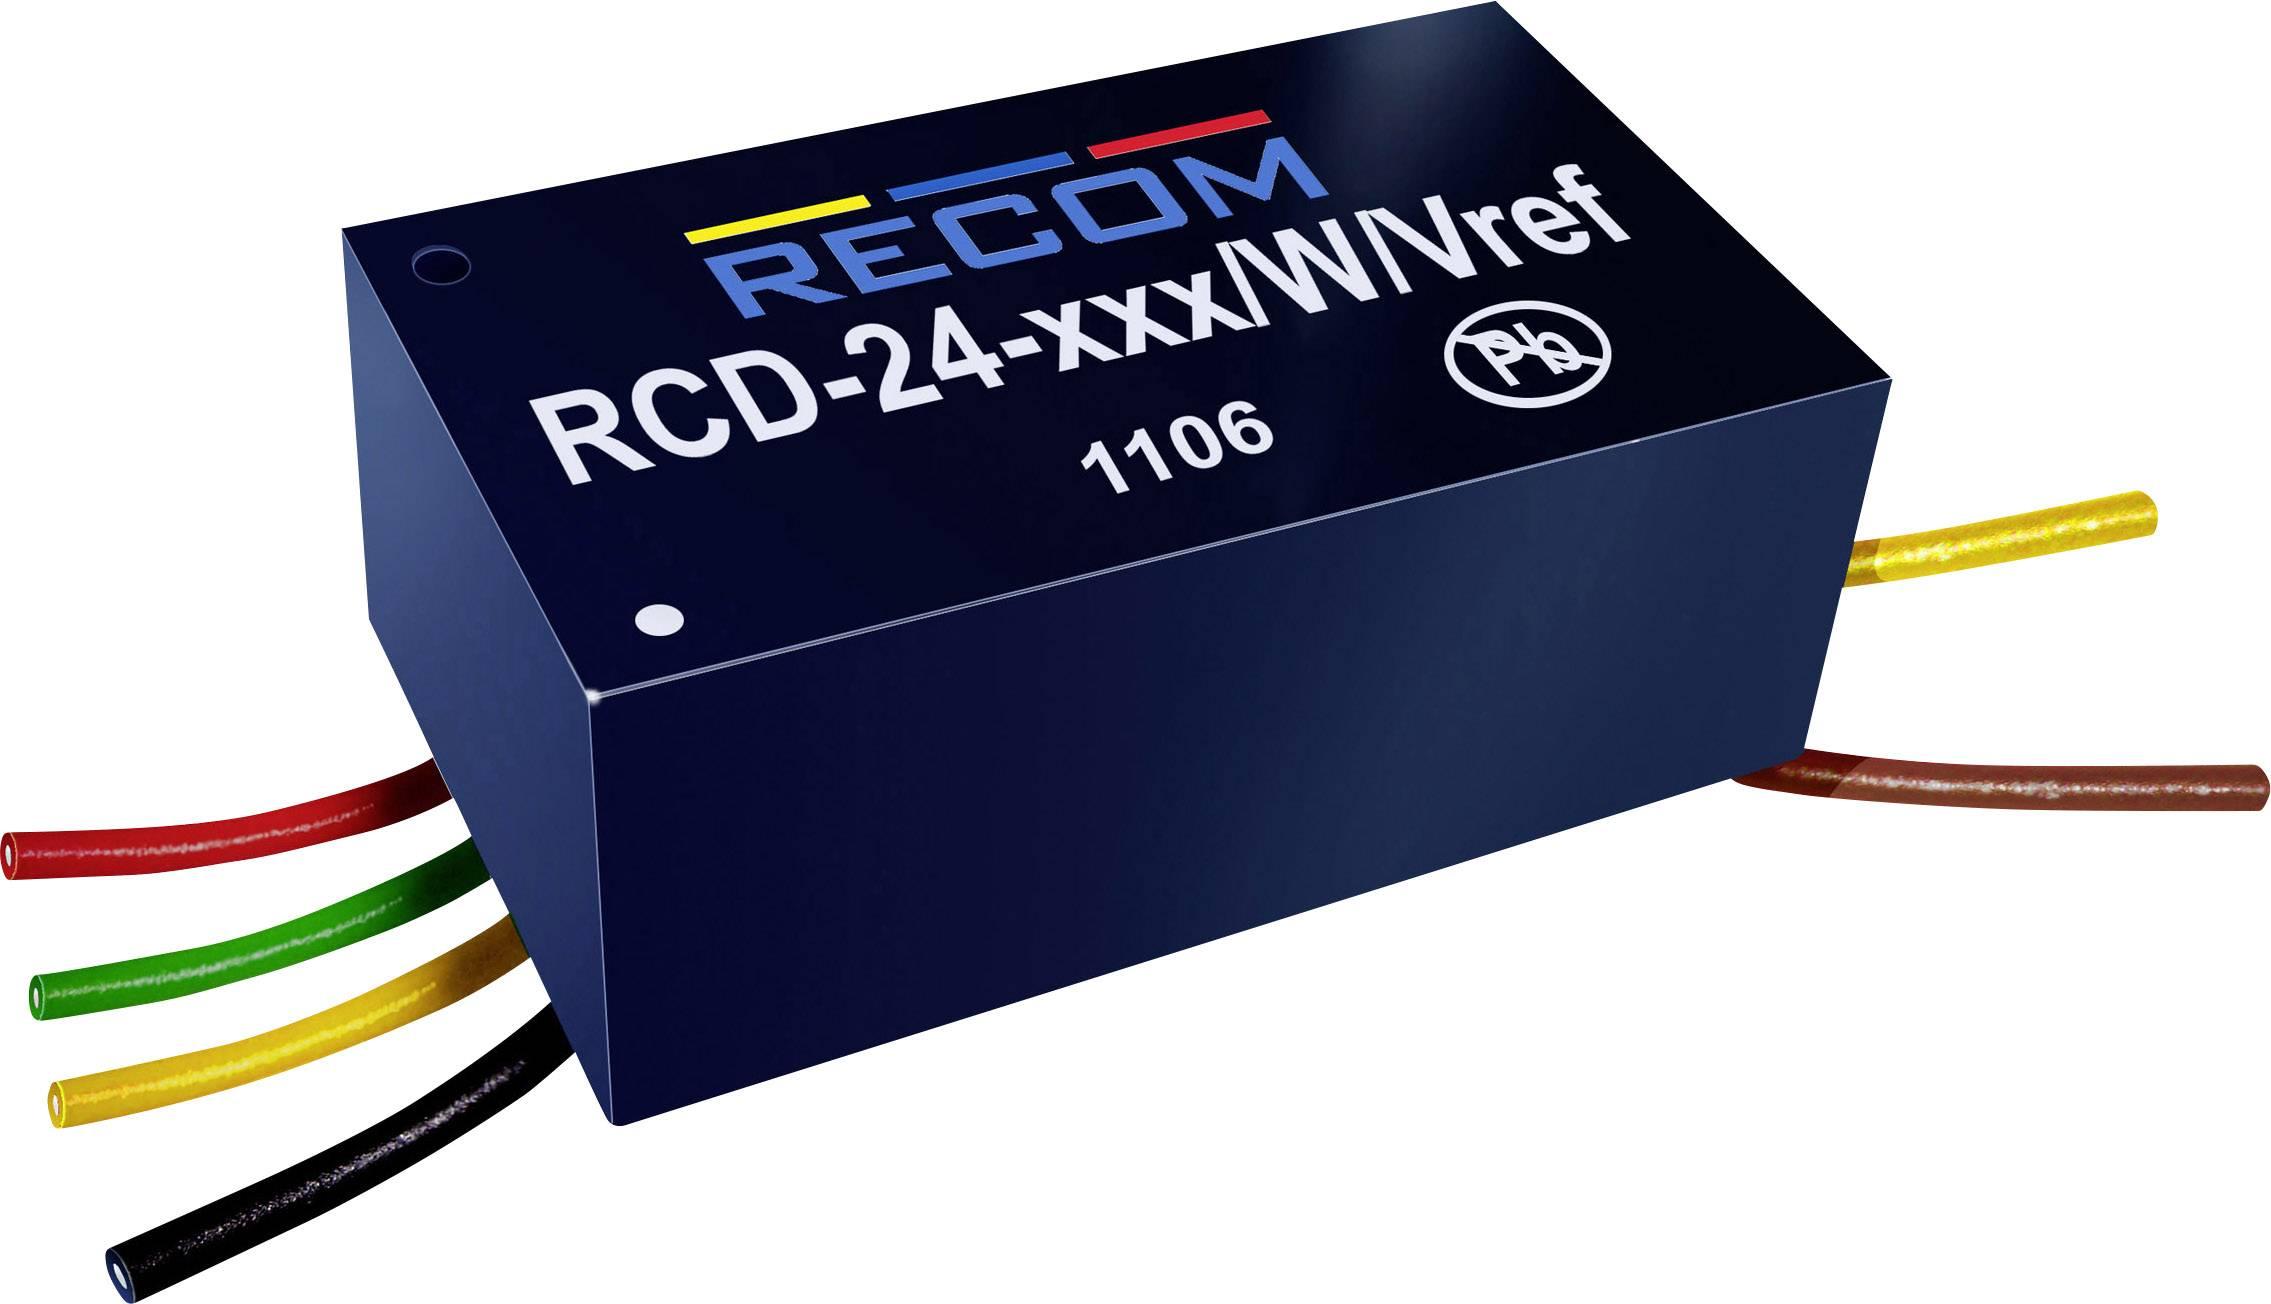 LED driver Recom Lighting, RCD-24-0.50/W, 36 V/DC, 500 mA